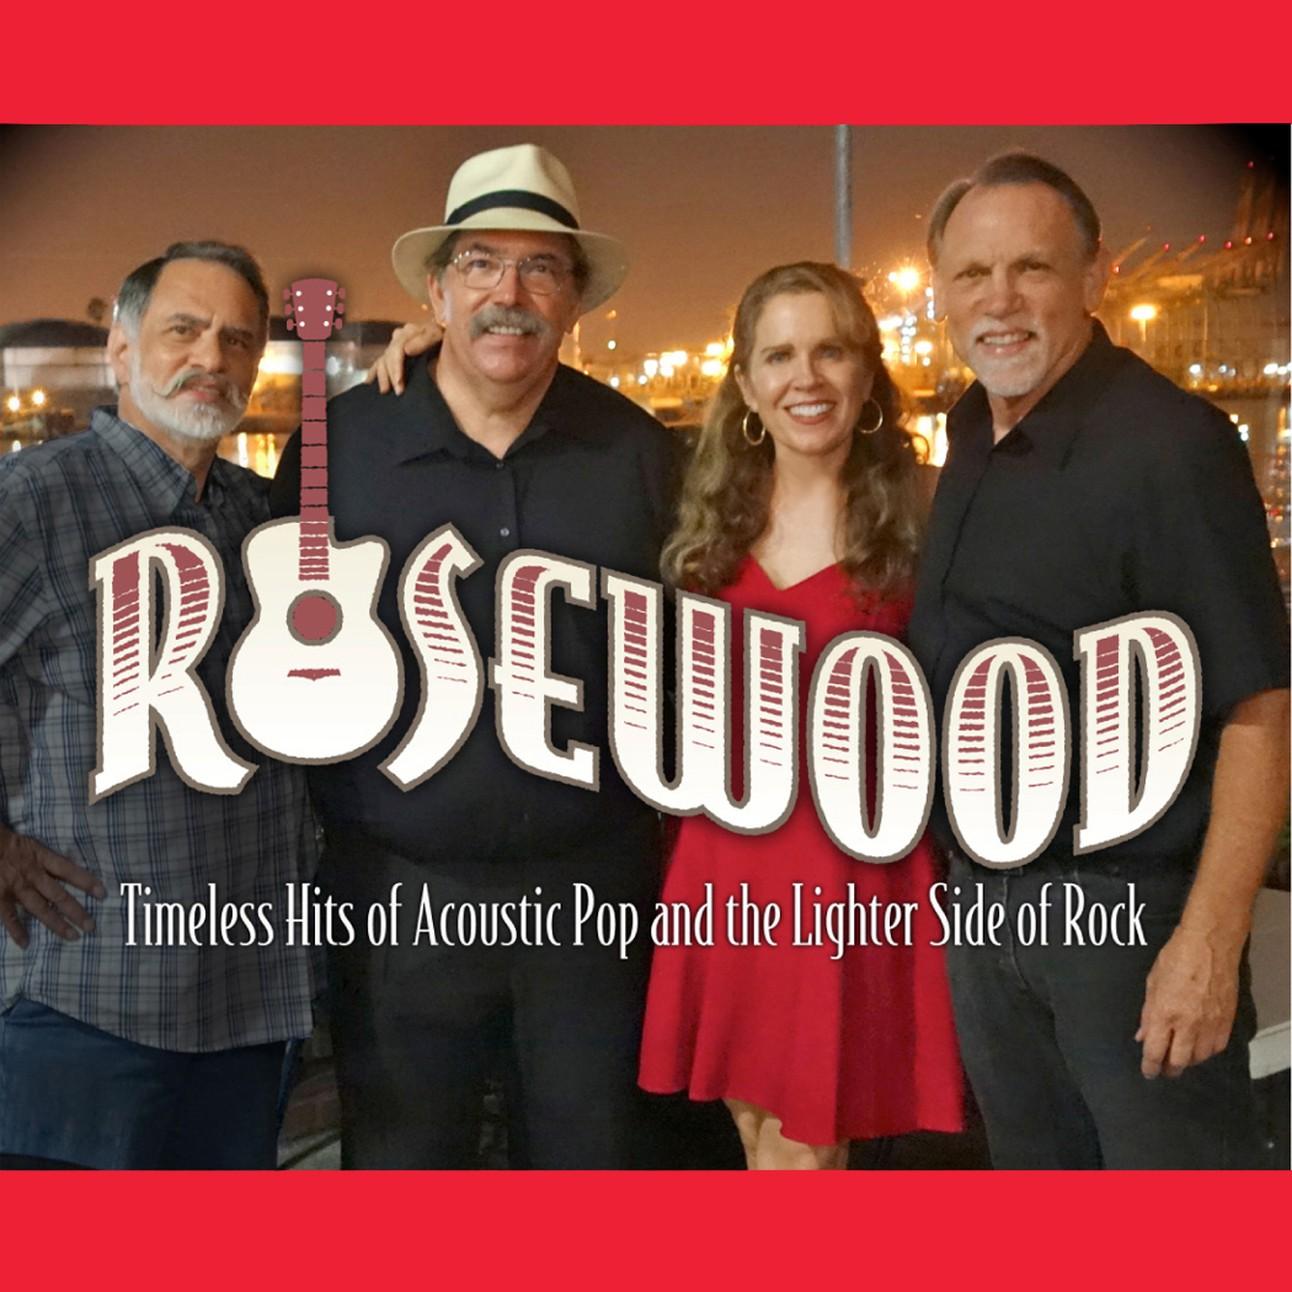 Rosewood Concert